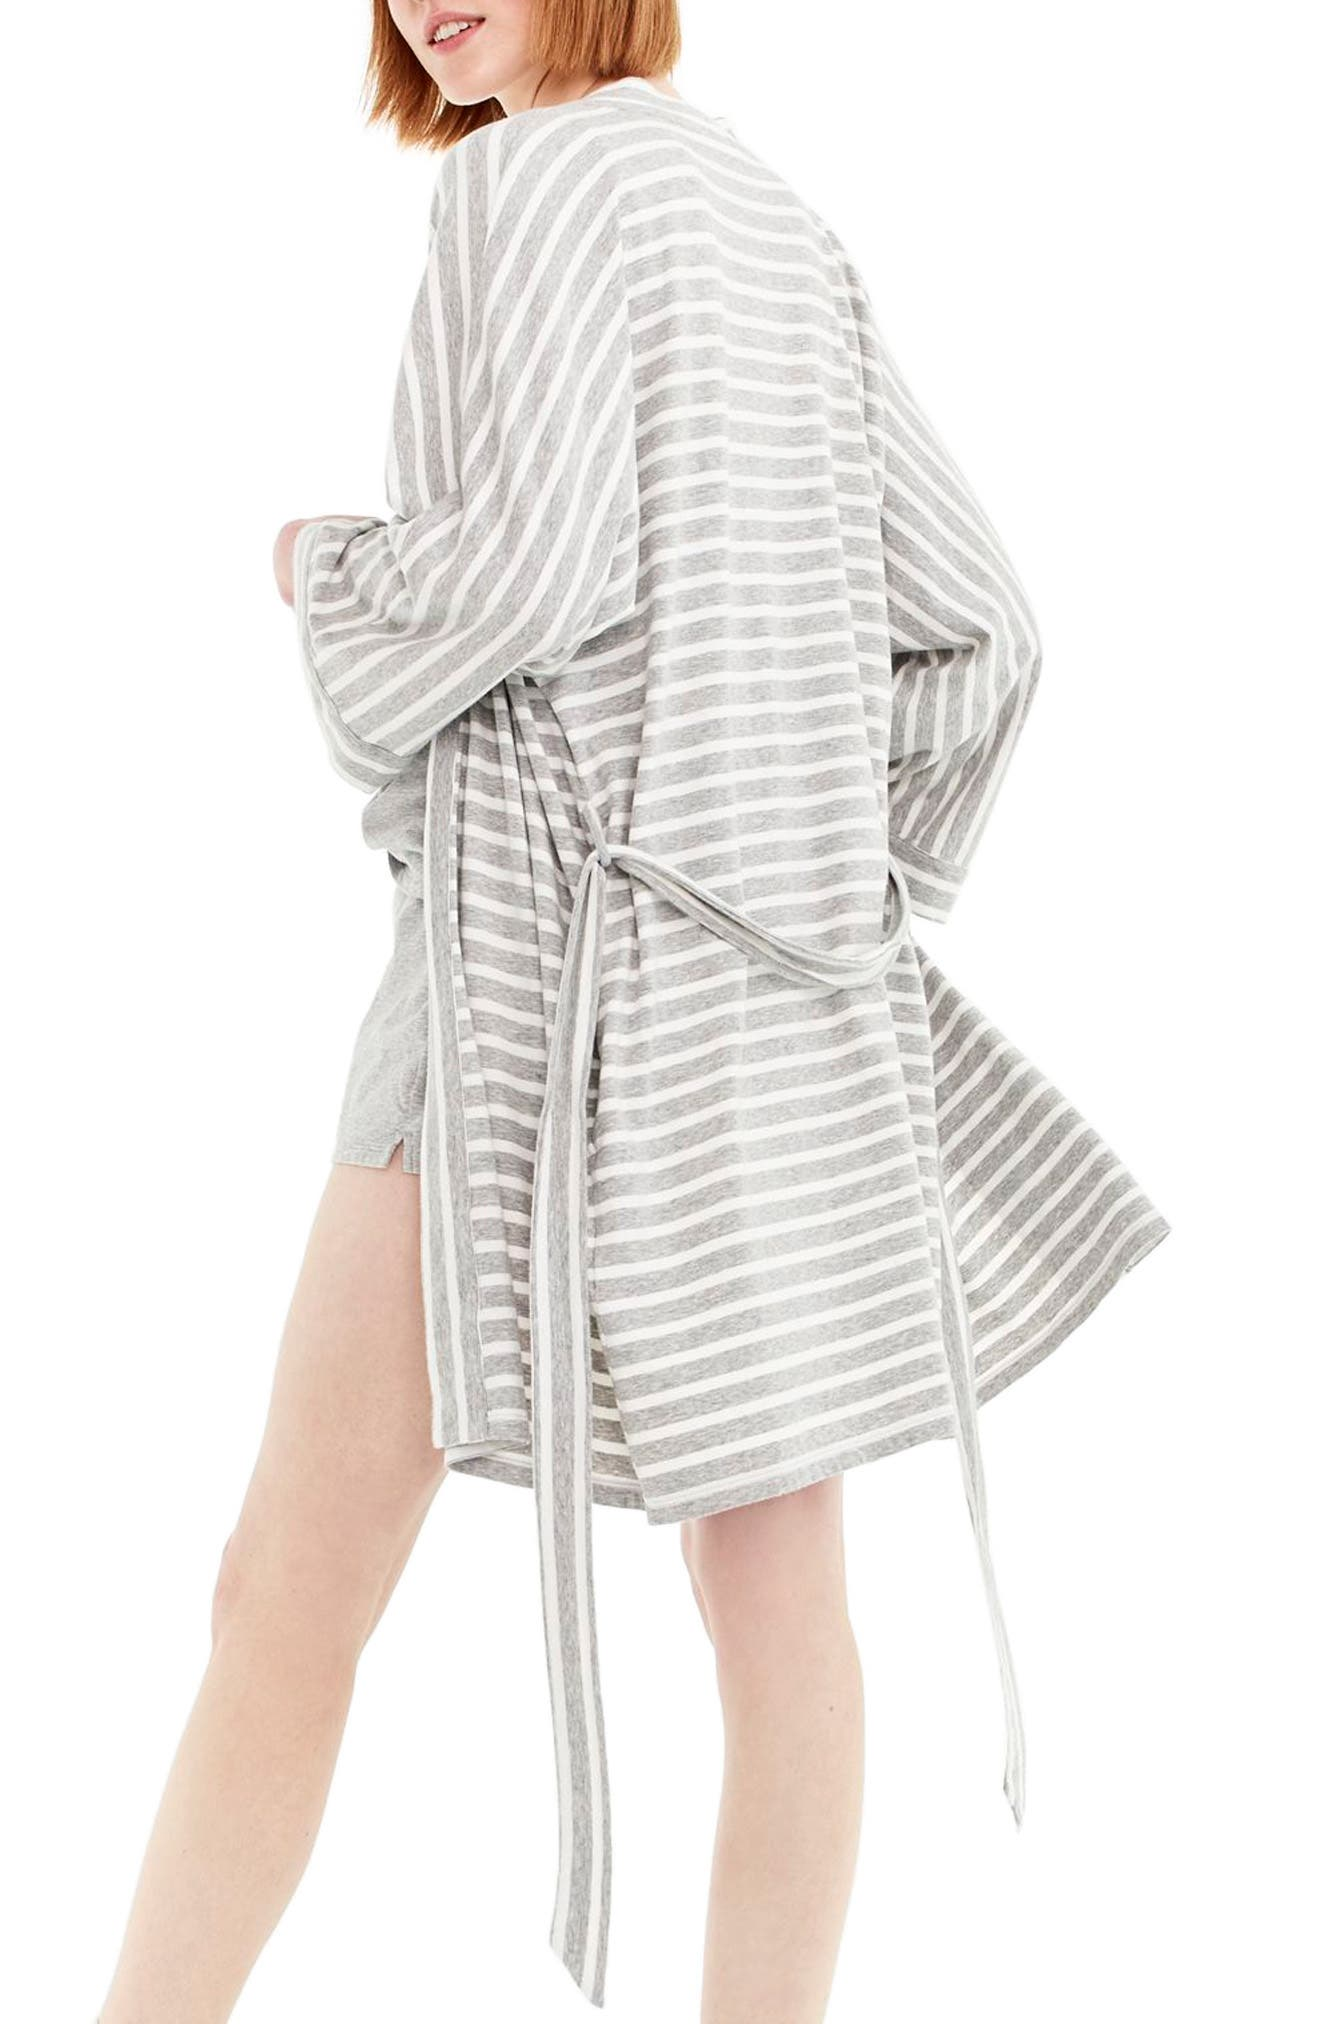 J.CREW,                             Stripe Stretch Cotton Robe,                             Alternate thumbnail 2, color,                             HTHR GRAY IVORY